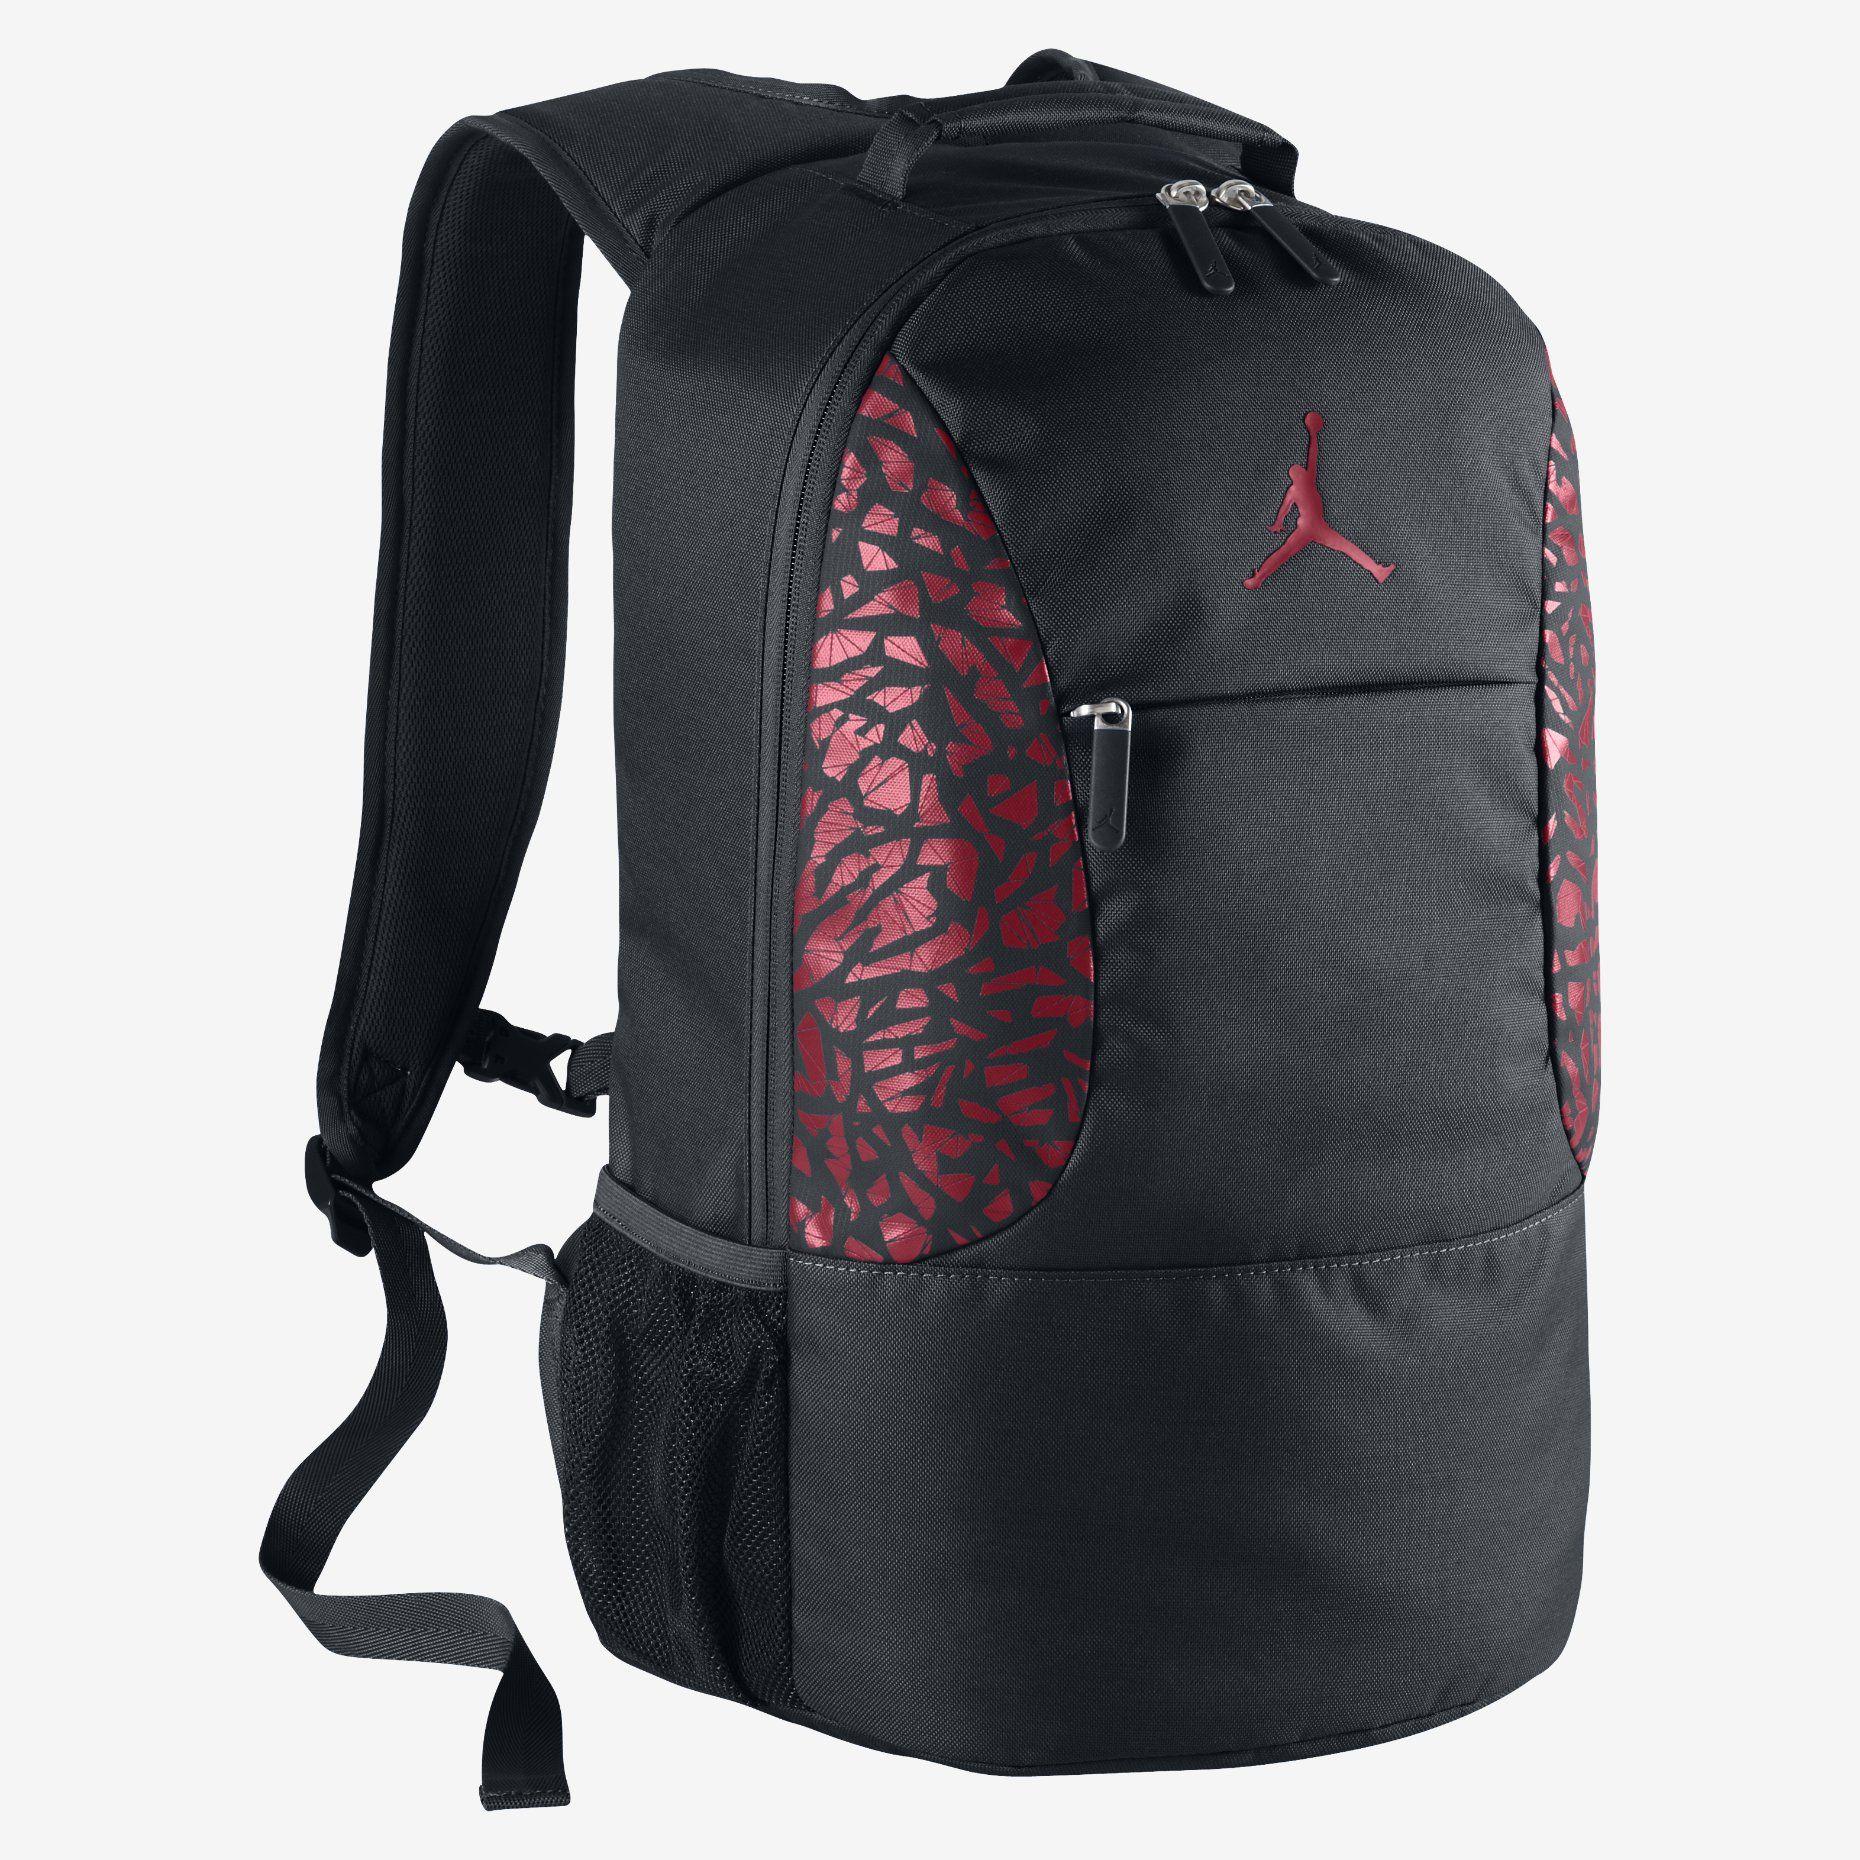 quality design c0949 4386e Nike Store. Jordan Aerofly Mania Backpack